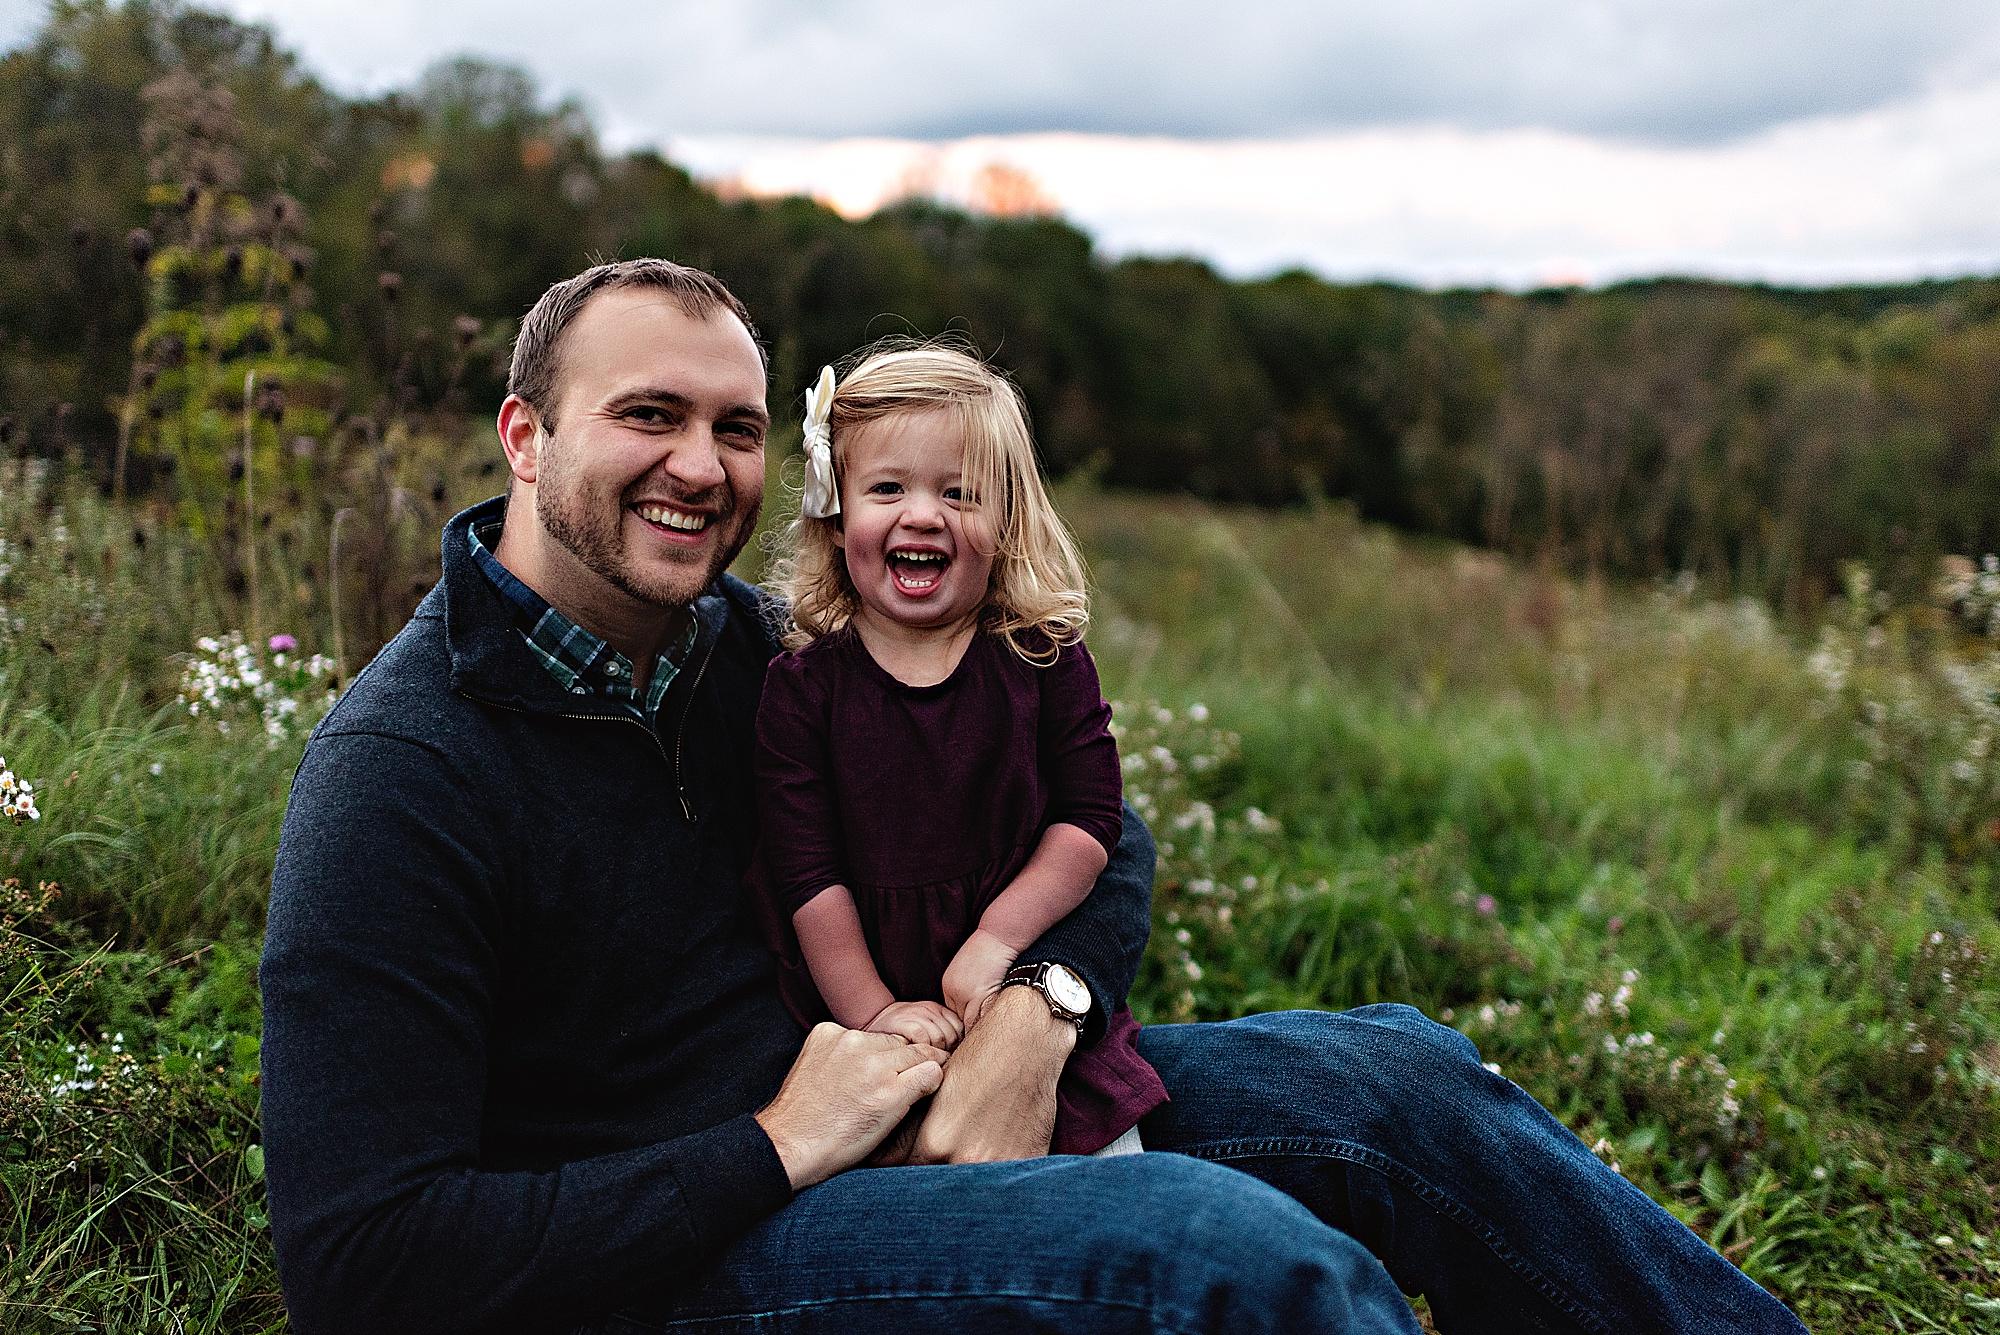 lauren-grayson-photography-akron-ohio-maternity-session-fall-hammer_0054.jpg